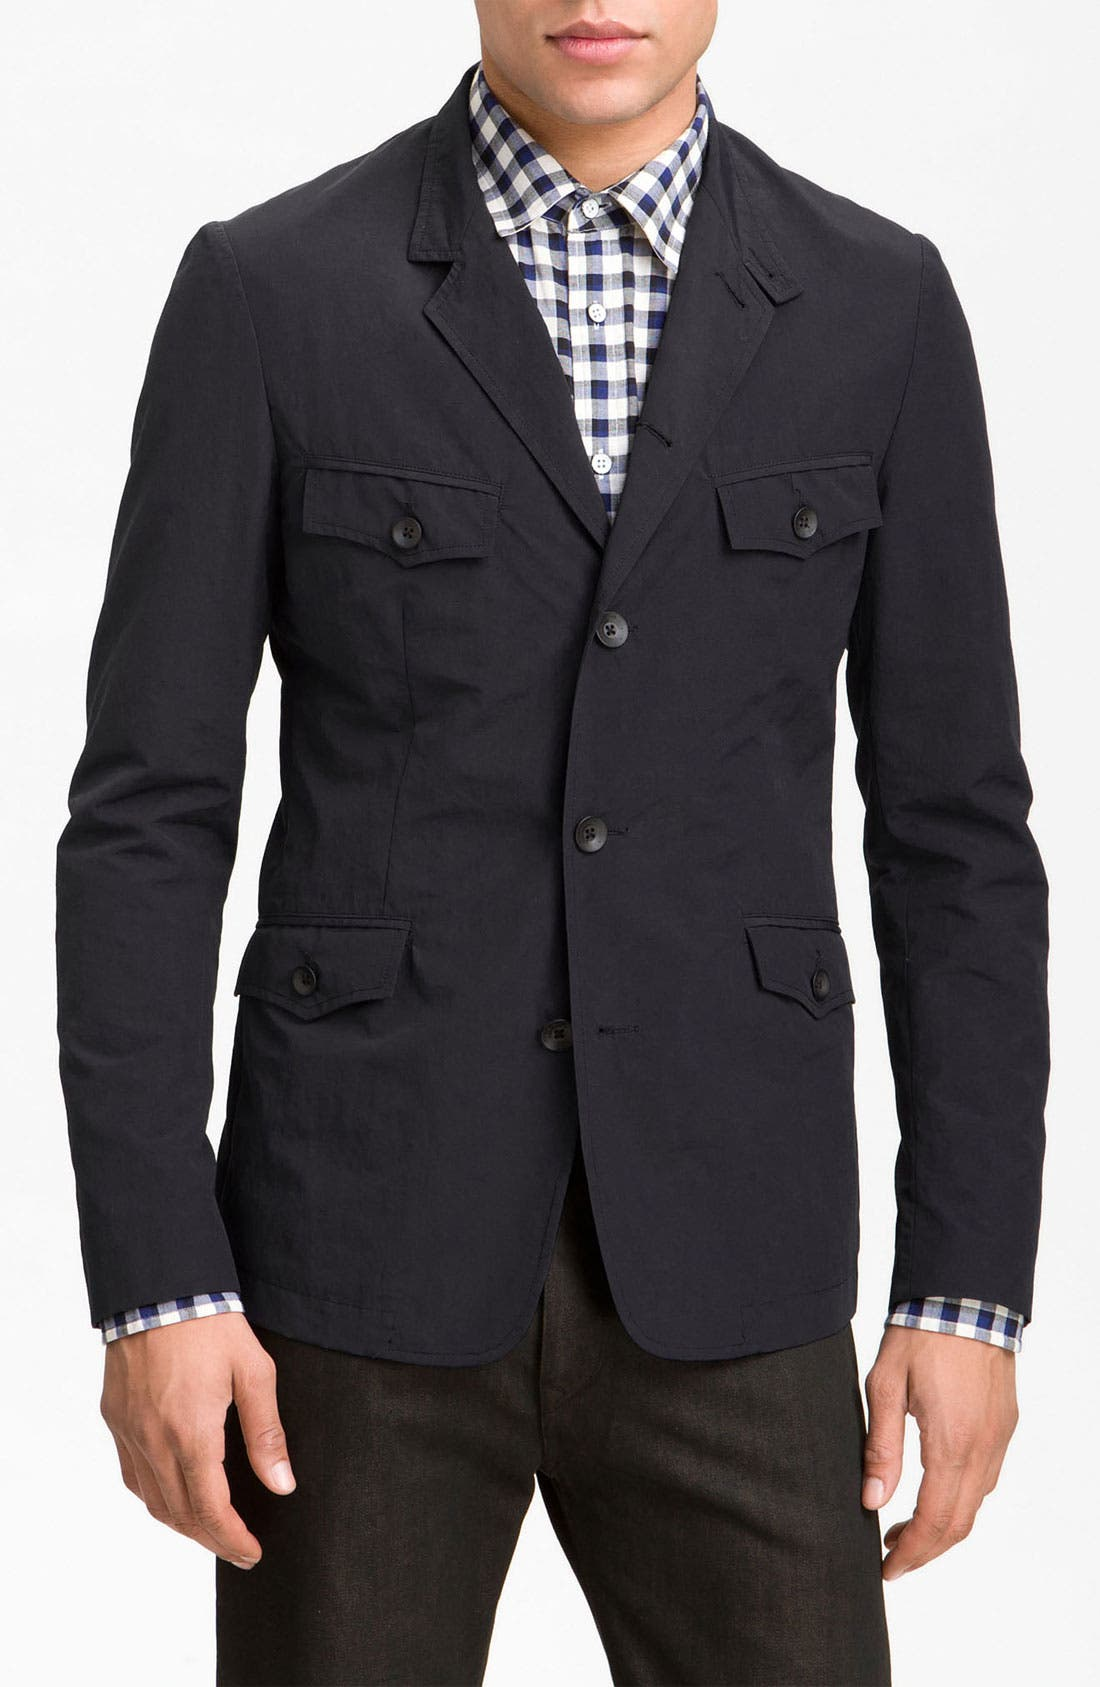 Main Image - rag & bone 'Service' Blazer